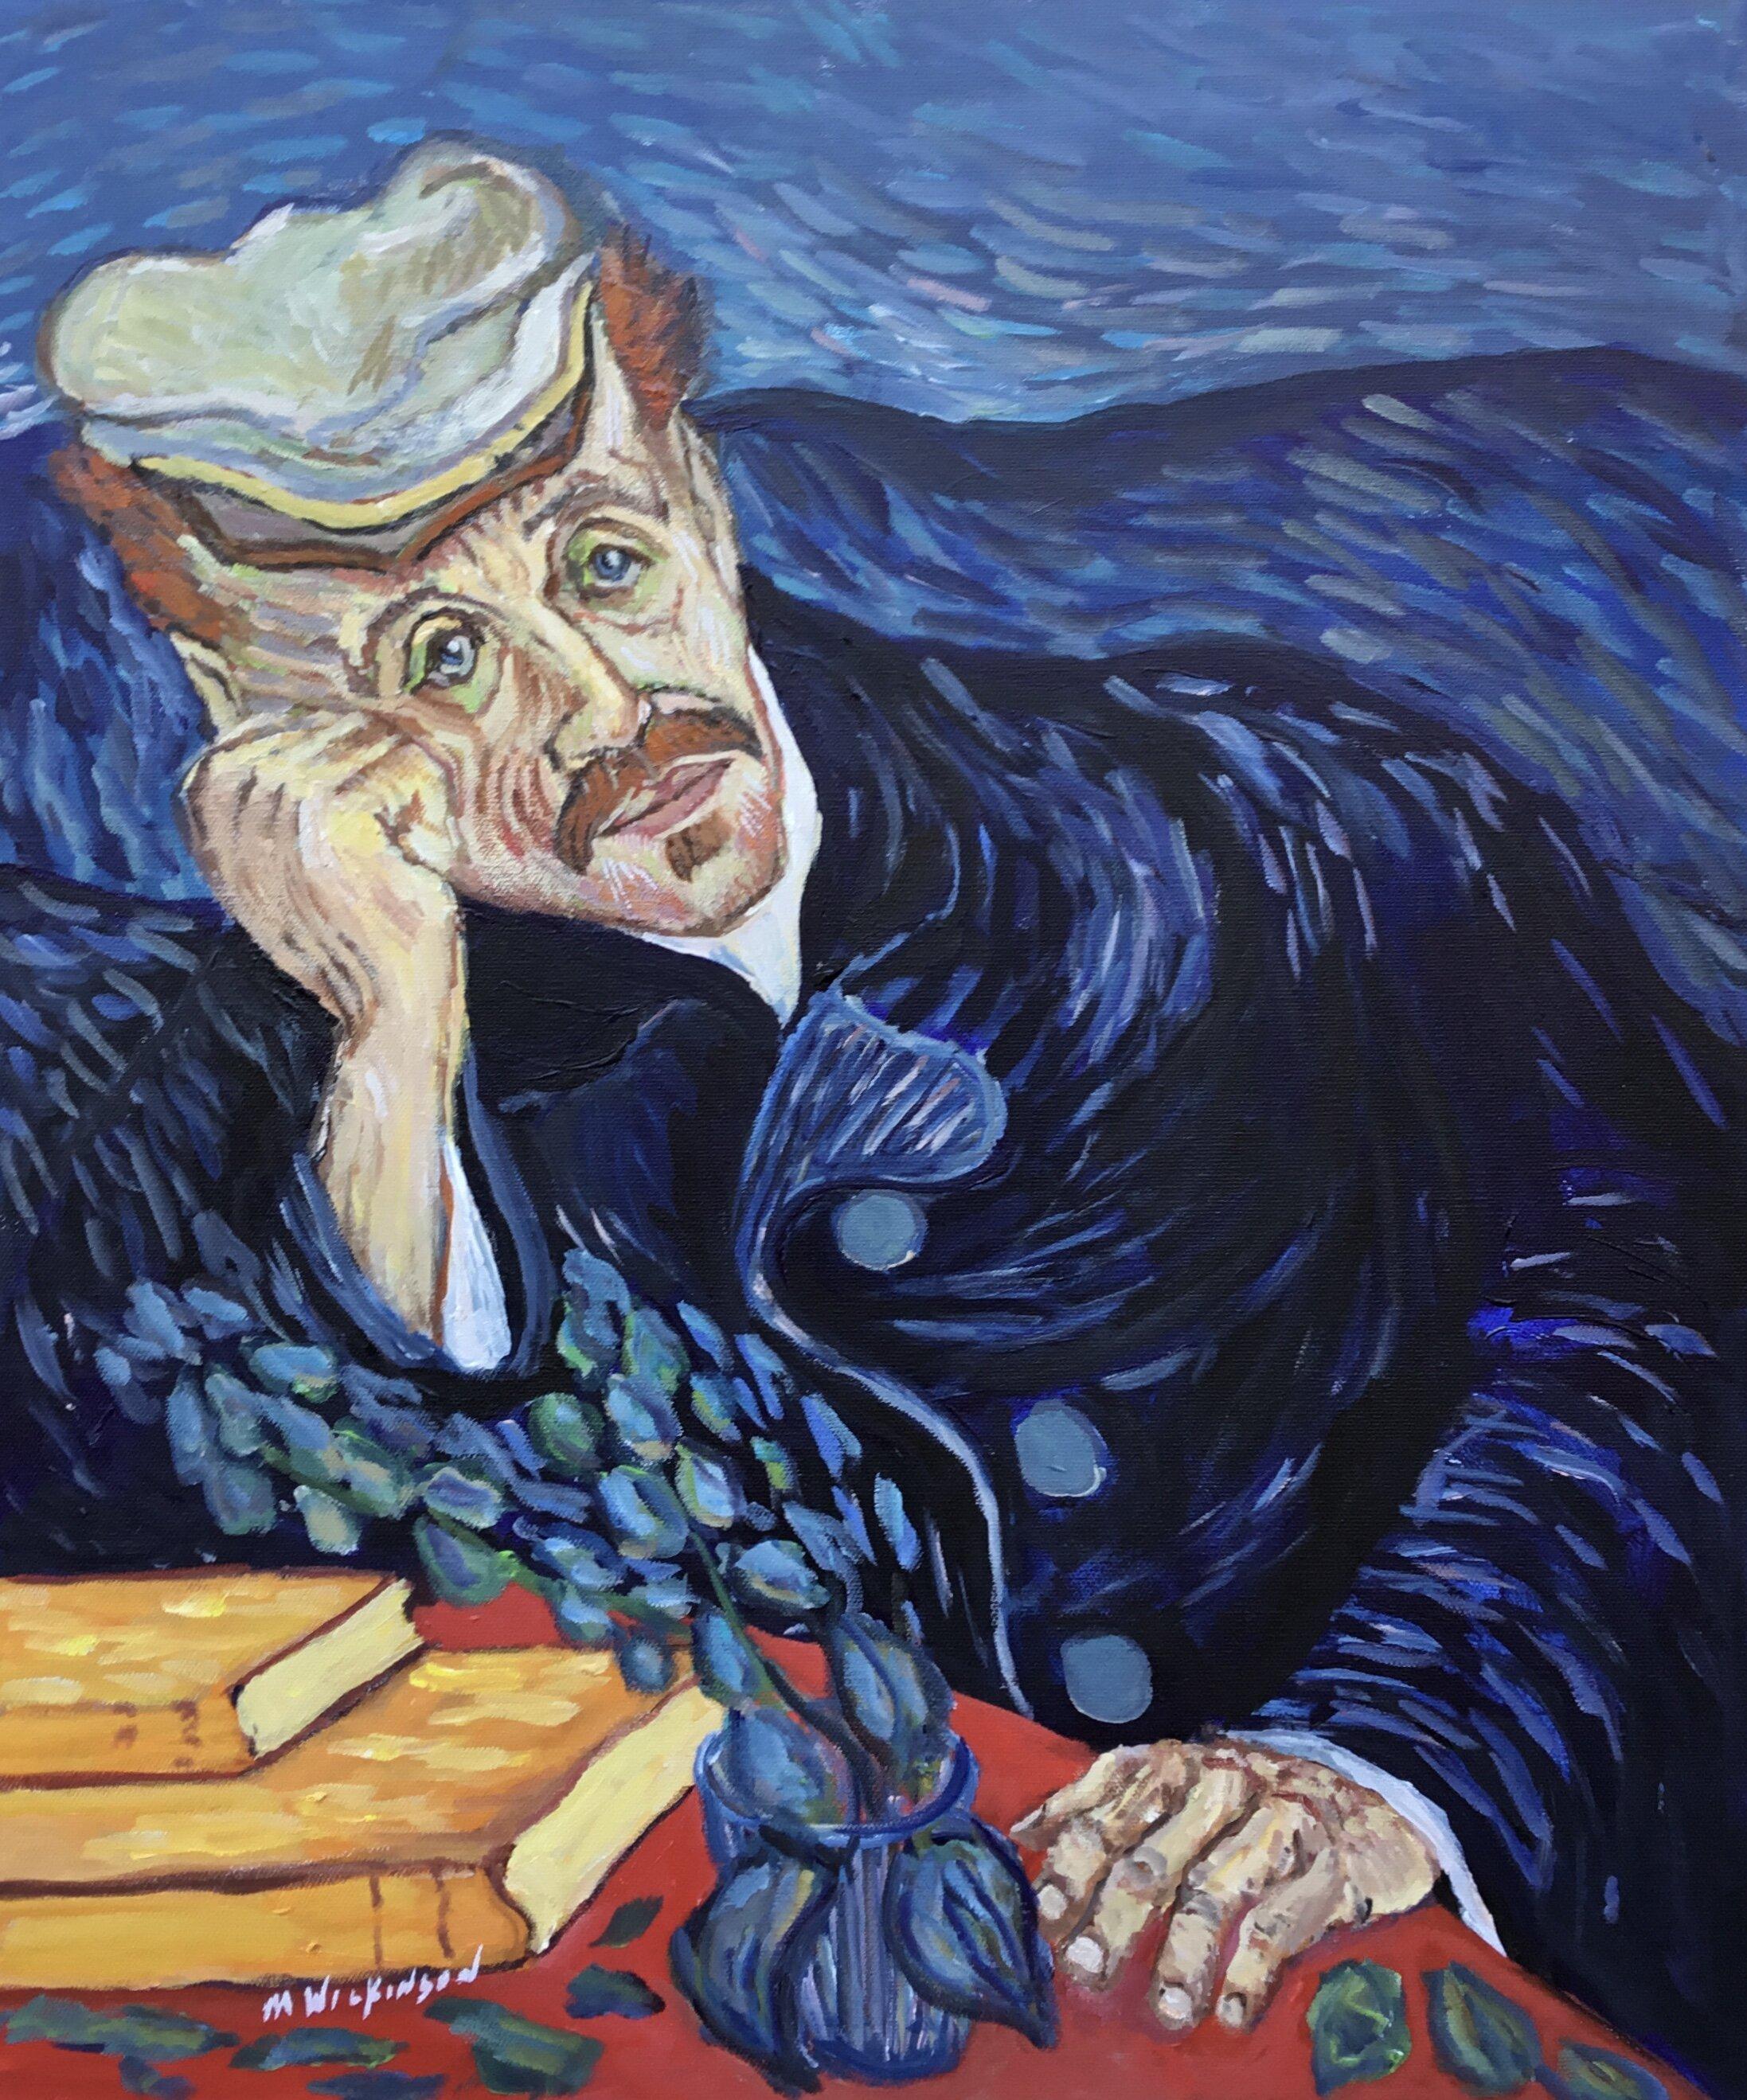 Van Gogh study / dr. gachet